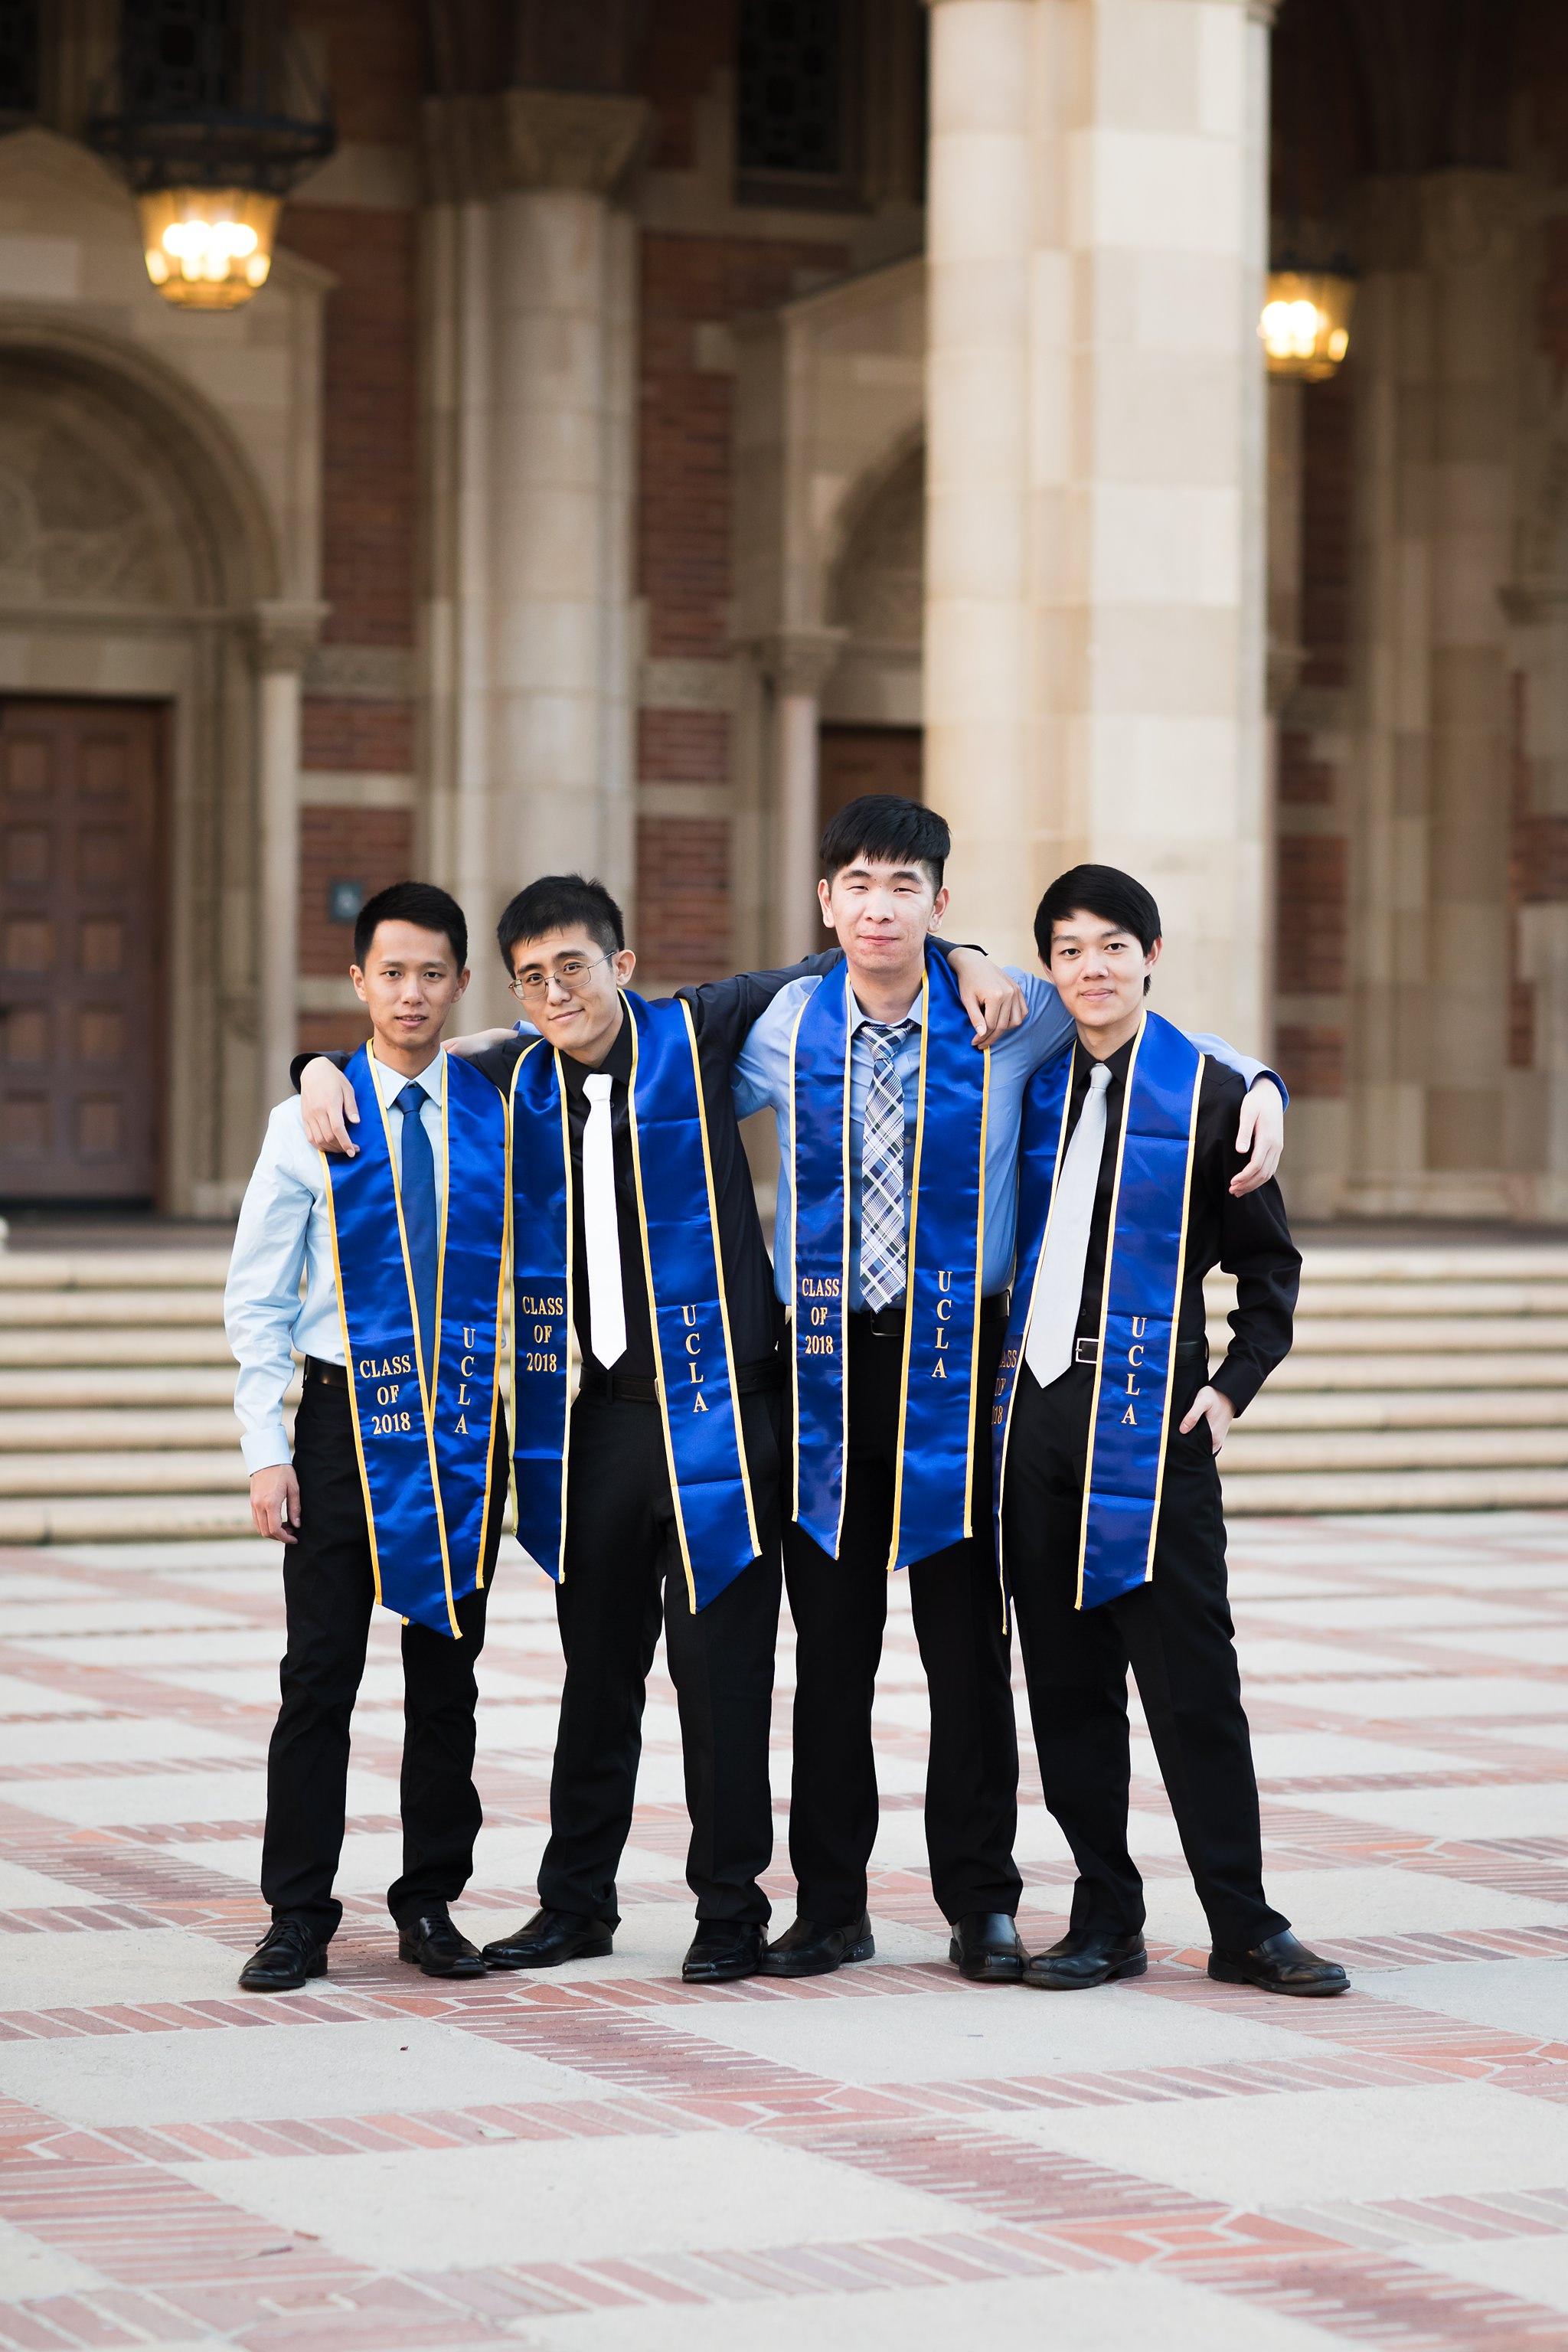 los-angeles-ucla-senior-graduation-portraits-royce-hall-friends